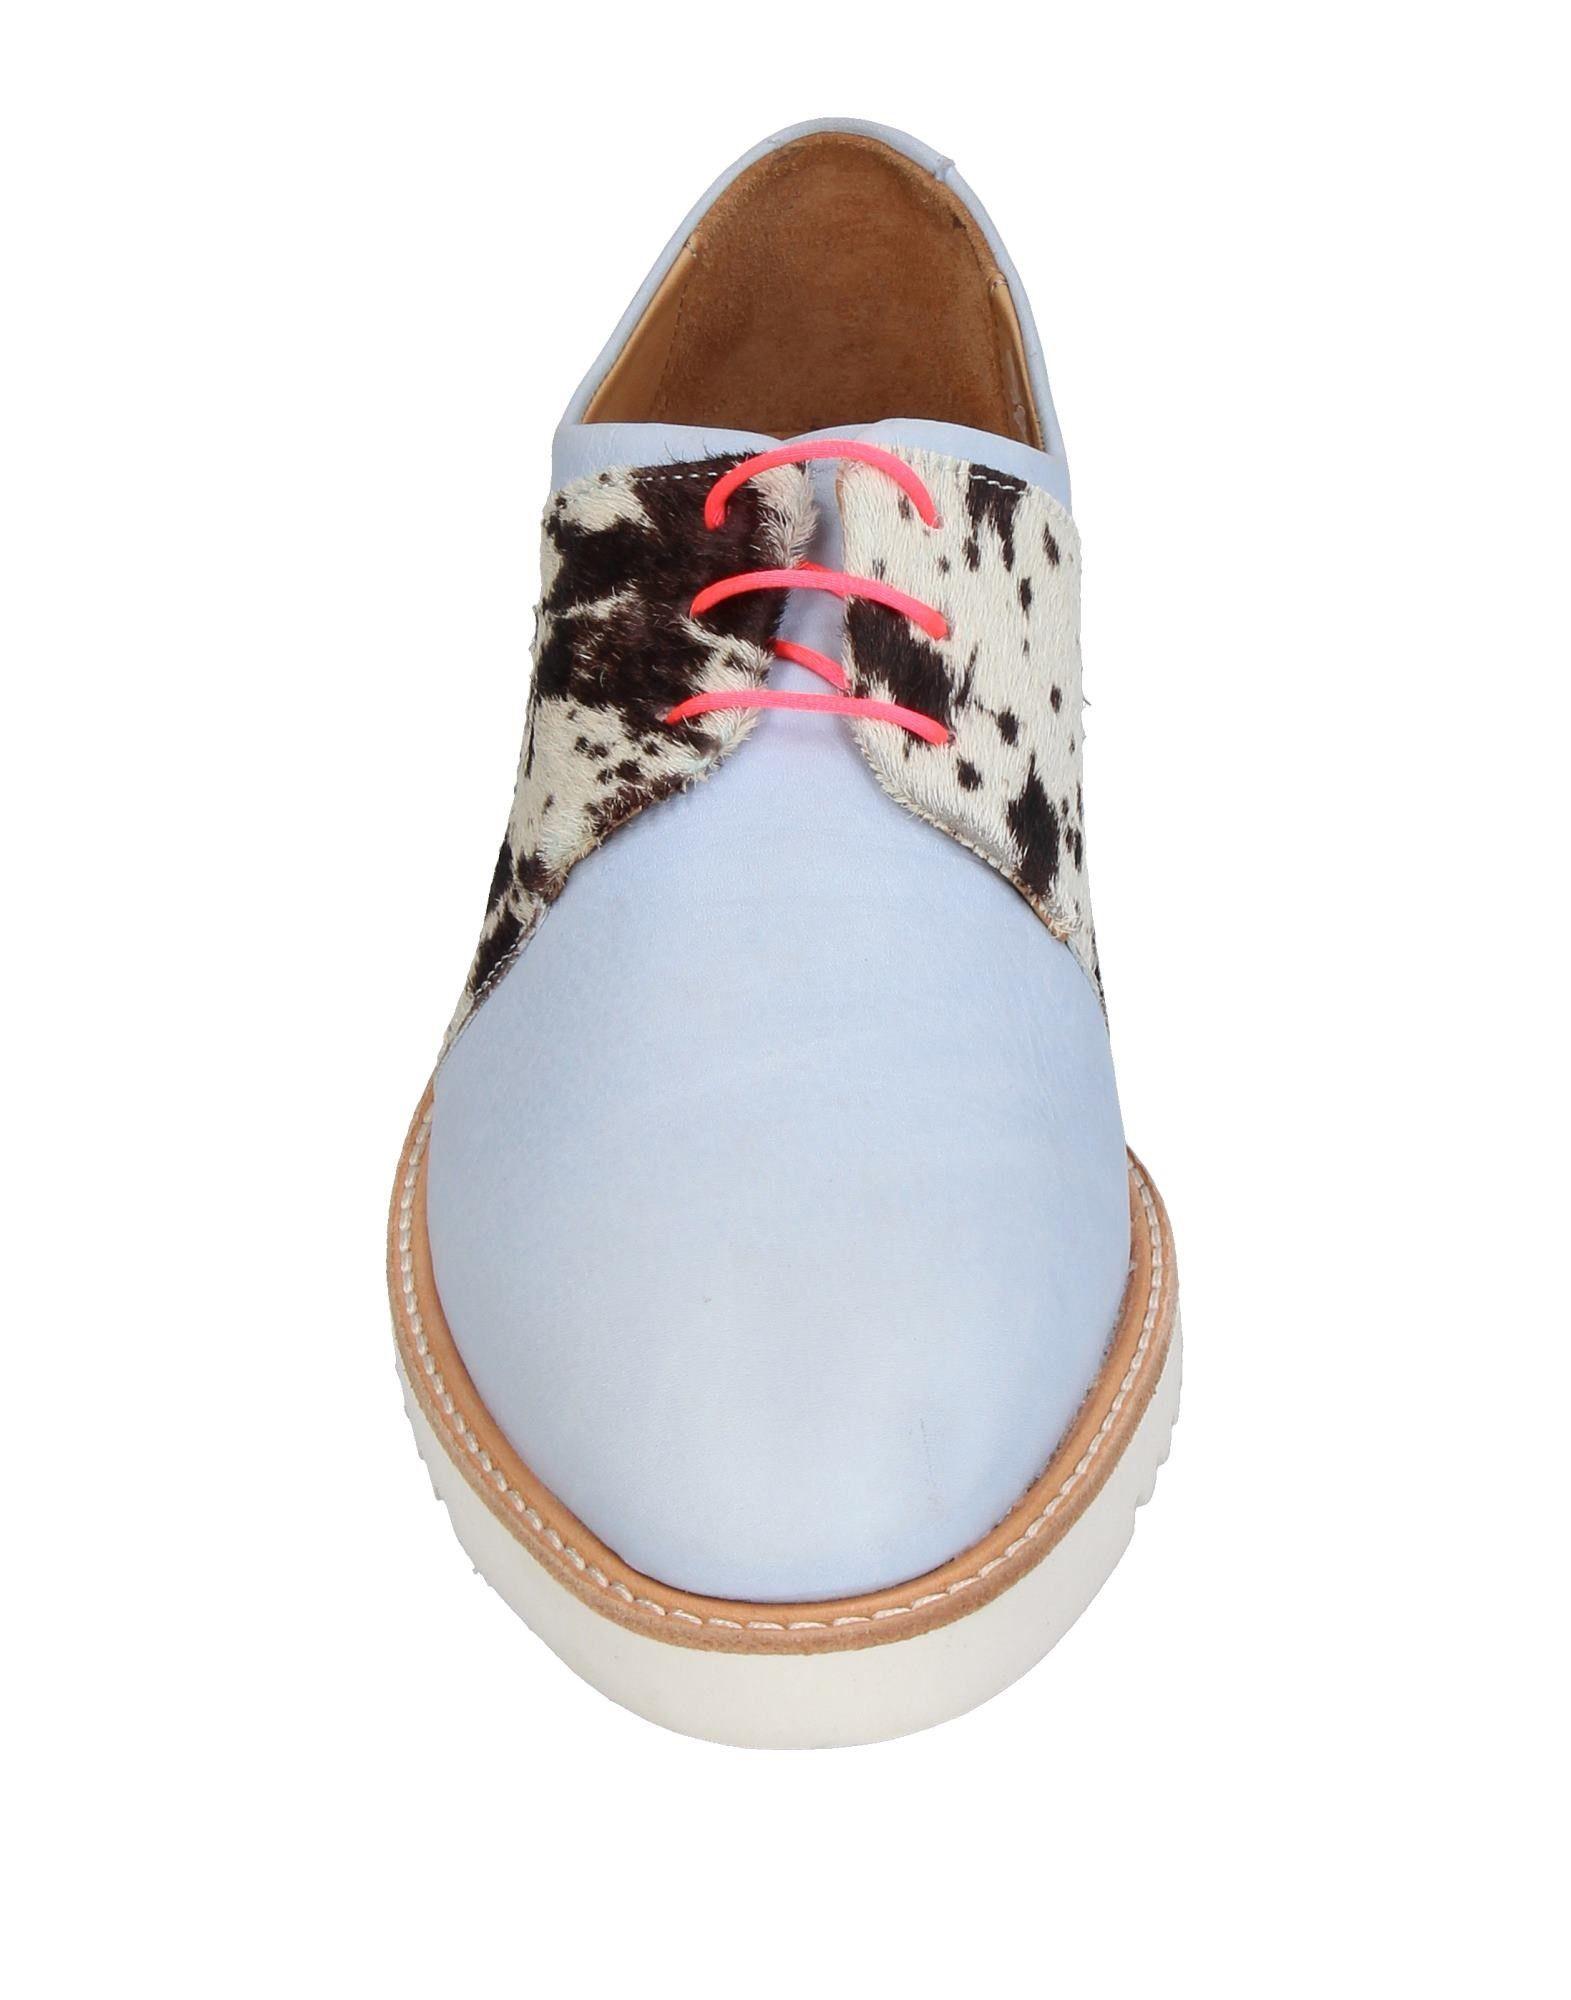 Rogue Rogue Rogue Matilda Sneakers Damen Gutes Preis-Leistungs-Verhältnis, es lohnt sich 4c6a35